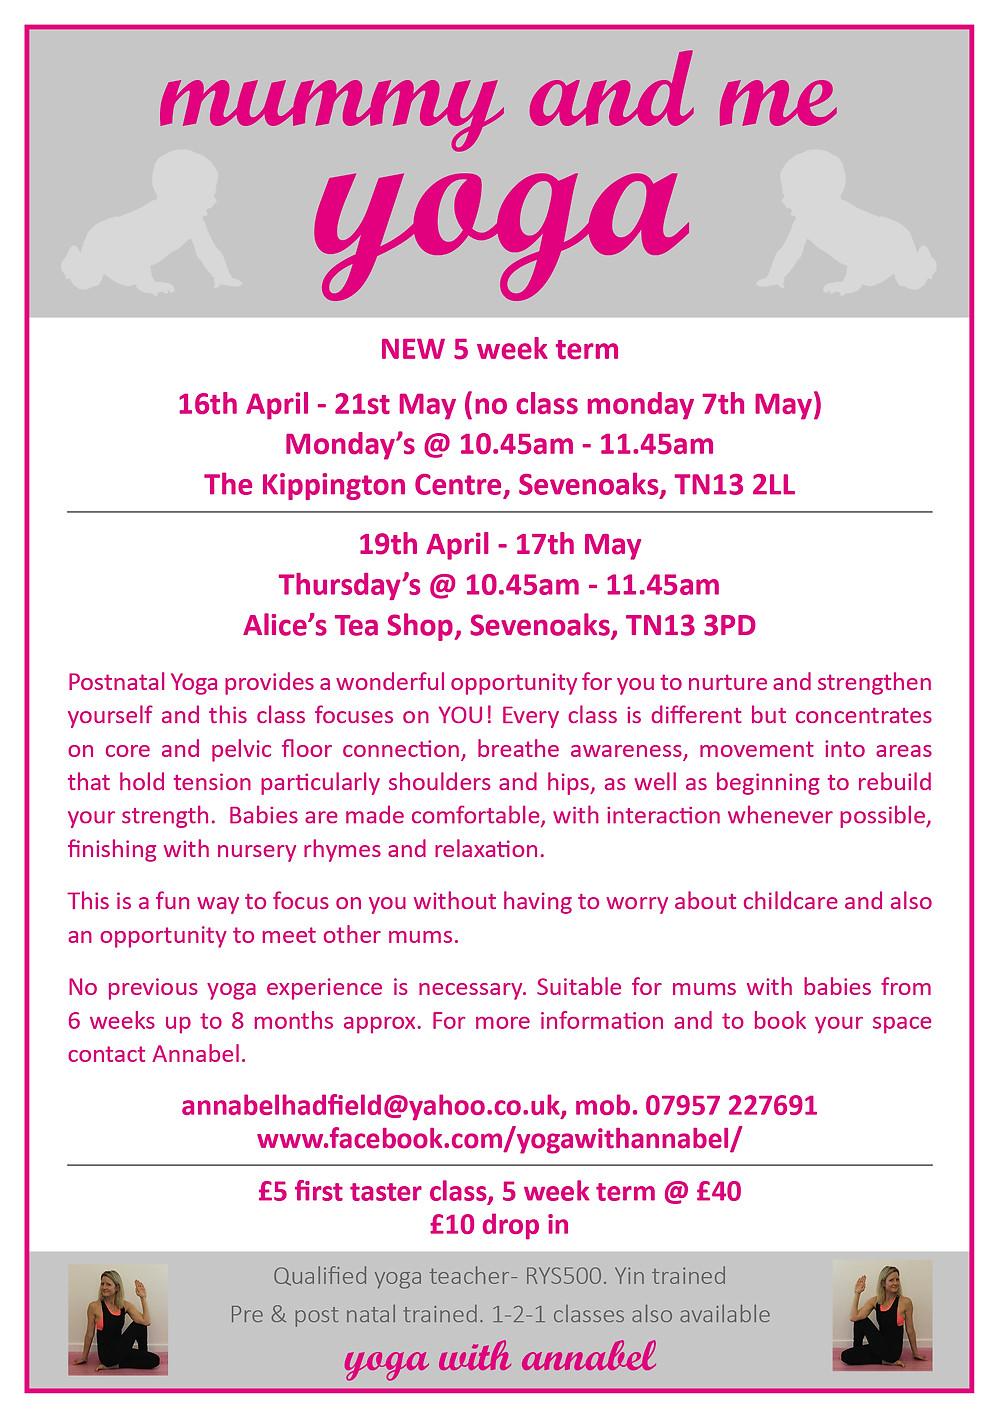 Mummy & Me yoga with Annabel Hadfield, Sevenoaks, Kent